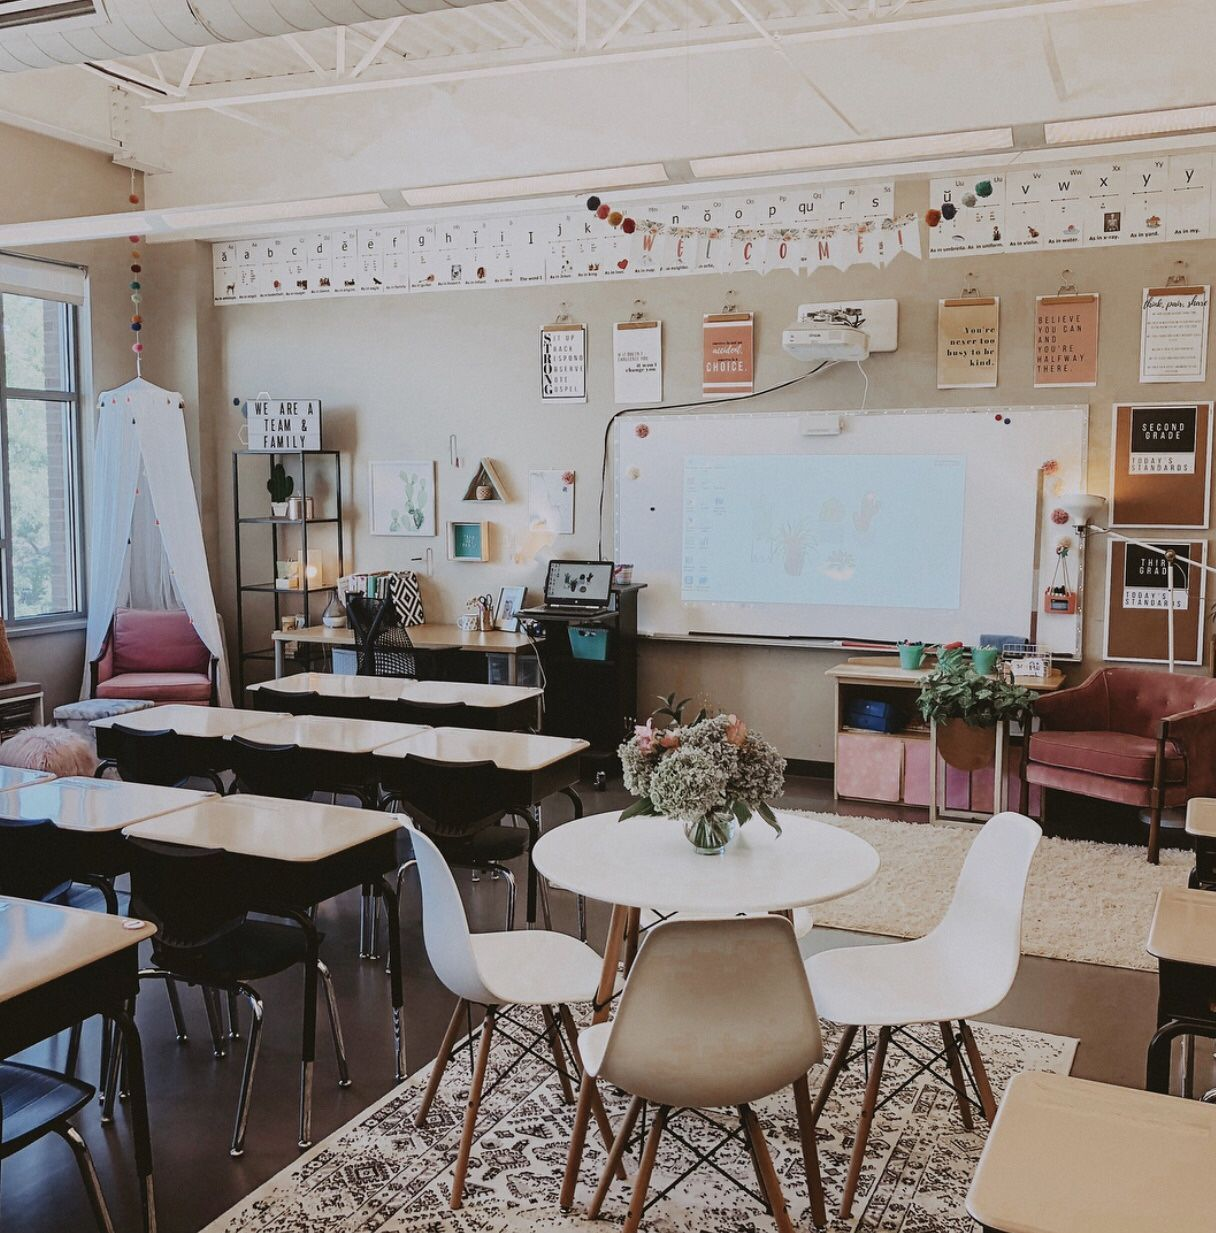 51 Best Classroom Decoration Ideas - 51 amazing classroom decoration ideas including how to create